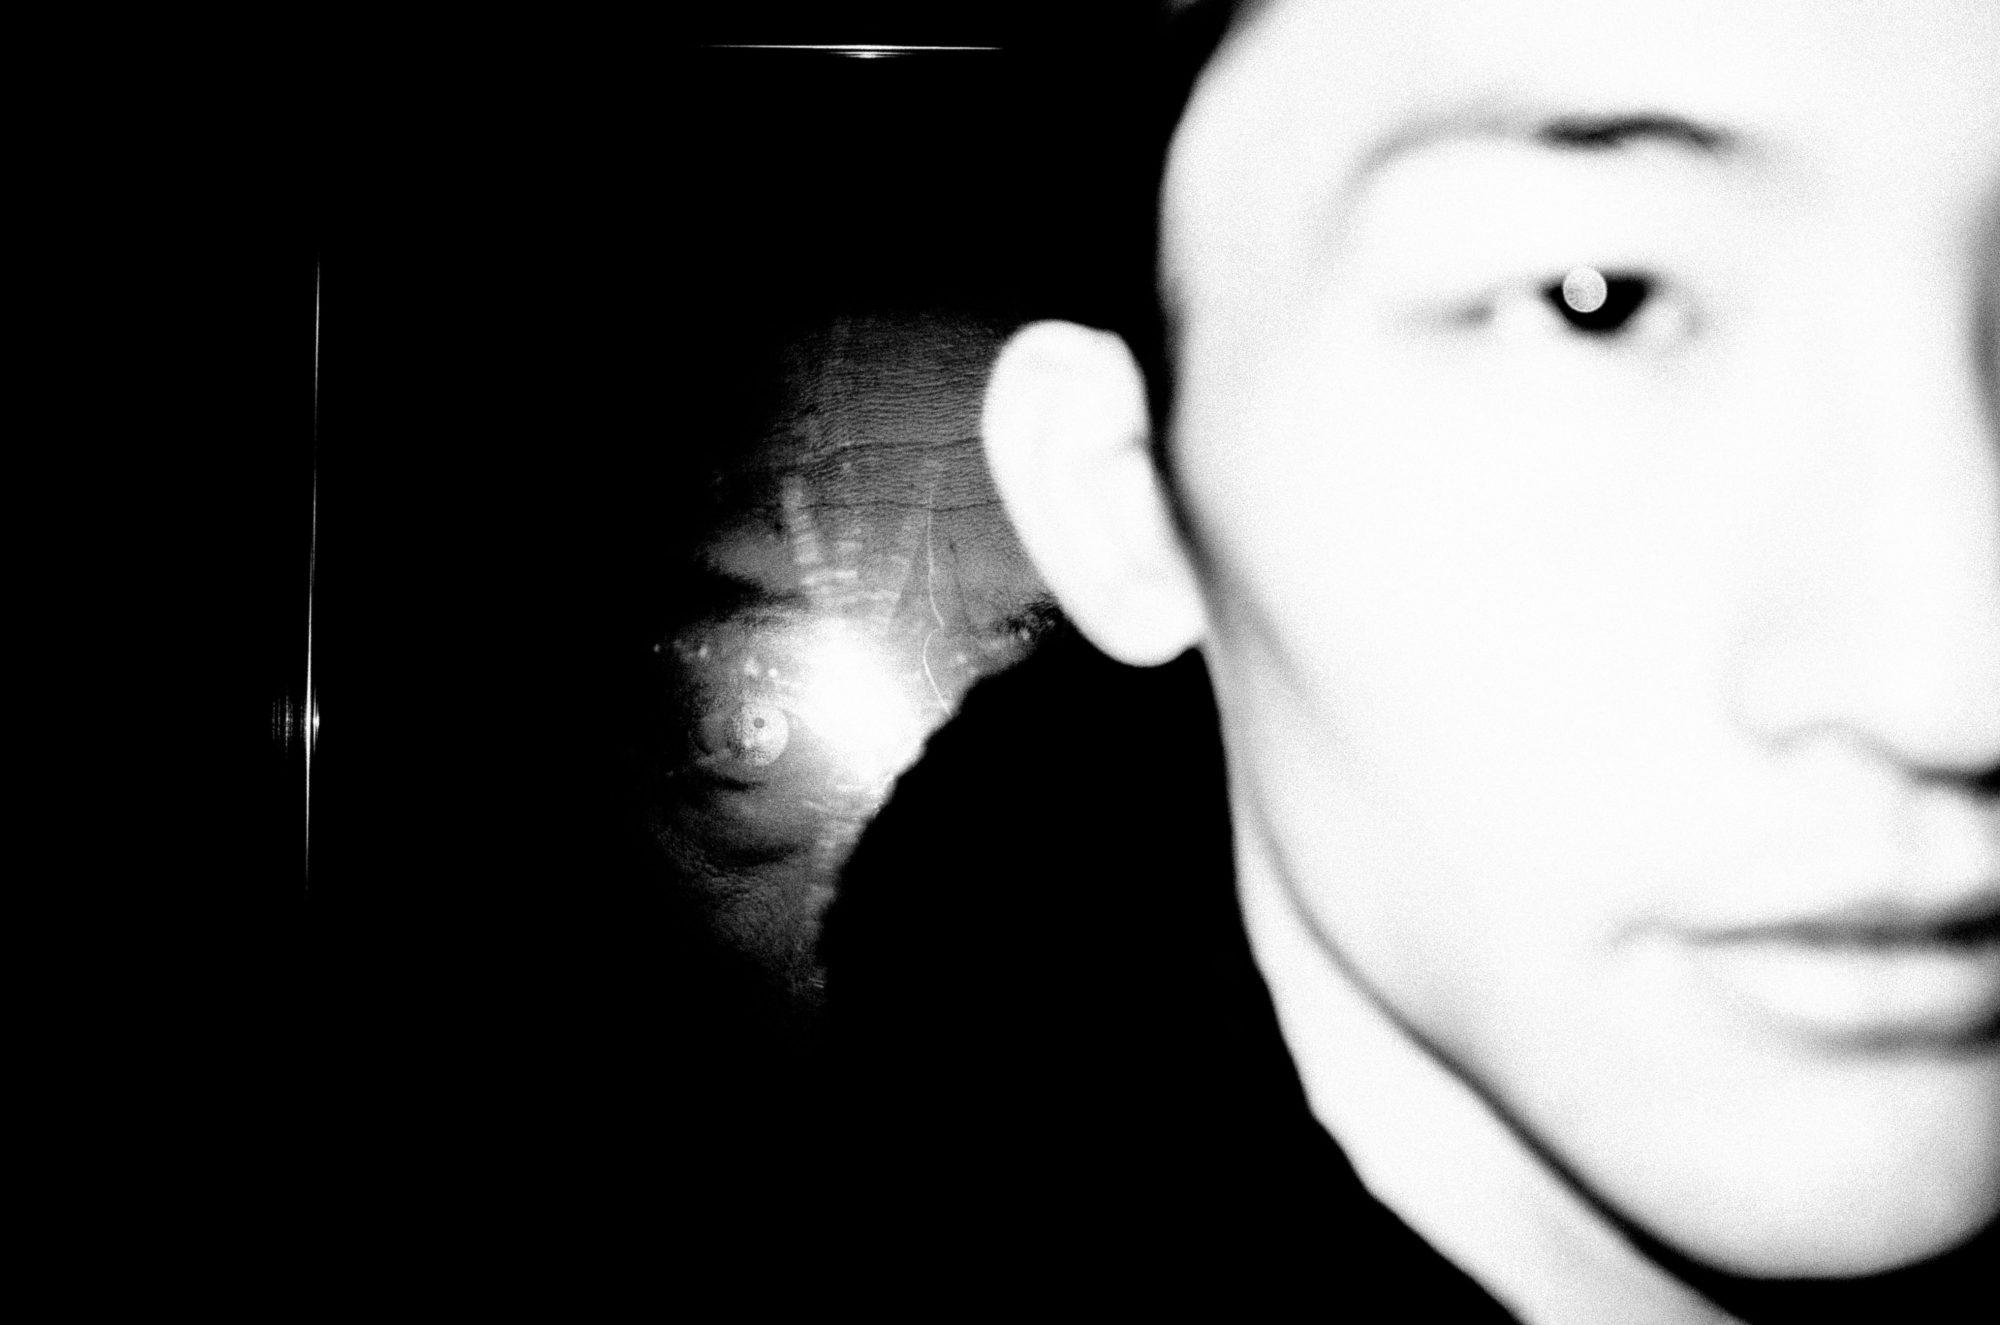 tokyo-eye-eric-kim-street-photography-contact-sheet-0000551